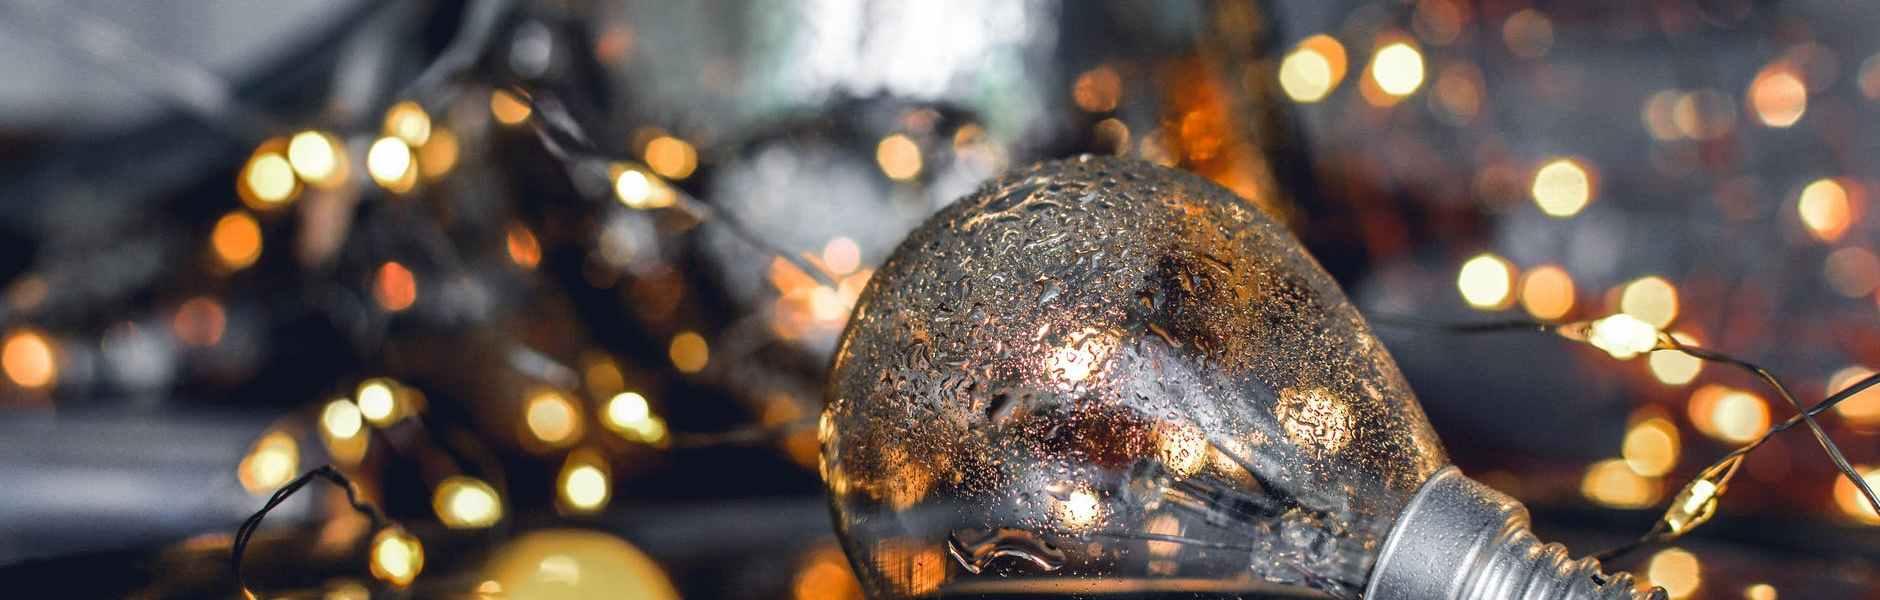 Horoskop po danima u tjednu od 14. do 20. prosinca, close up photography of bulb on water